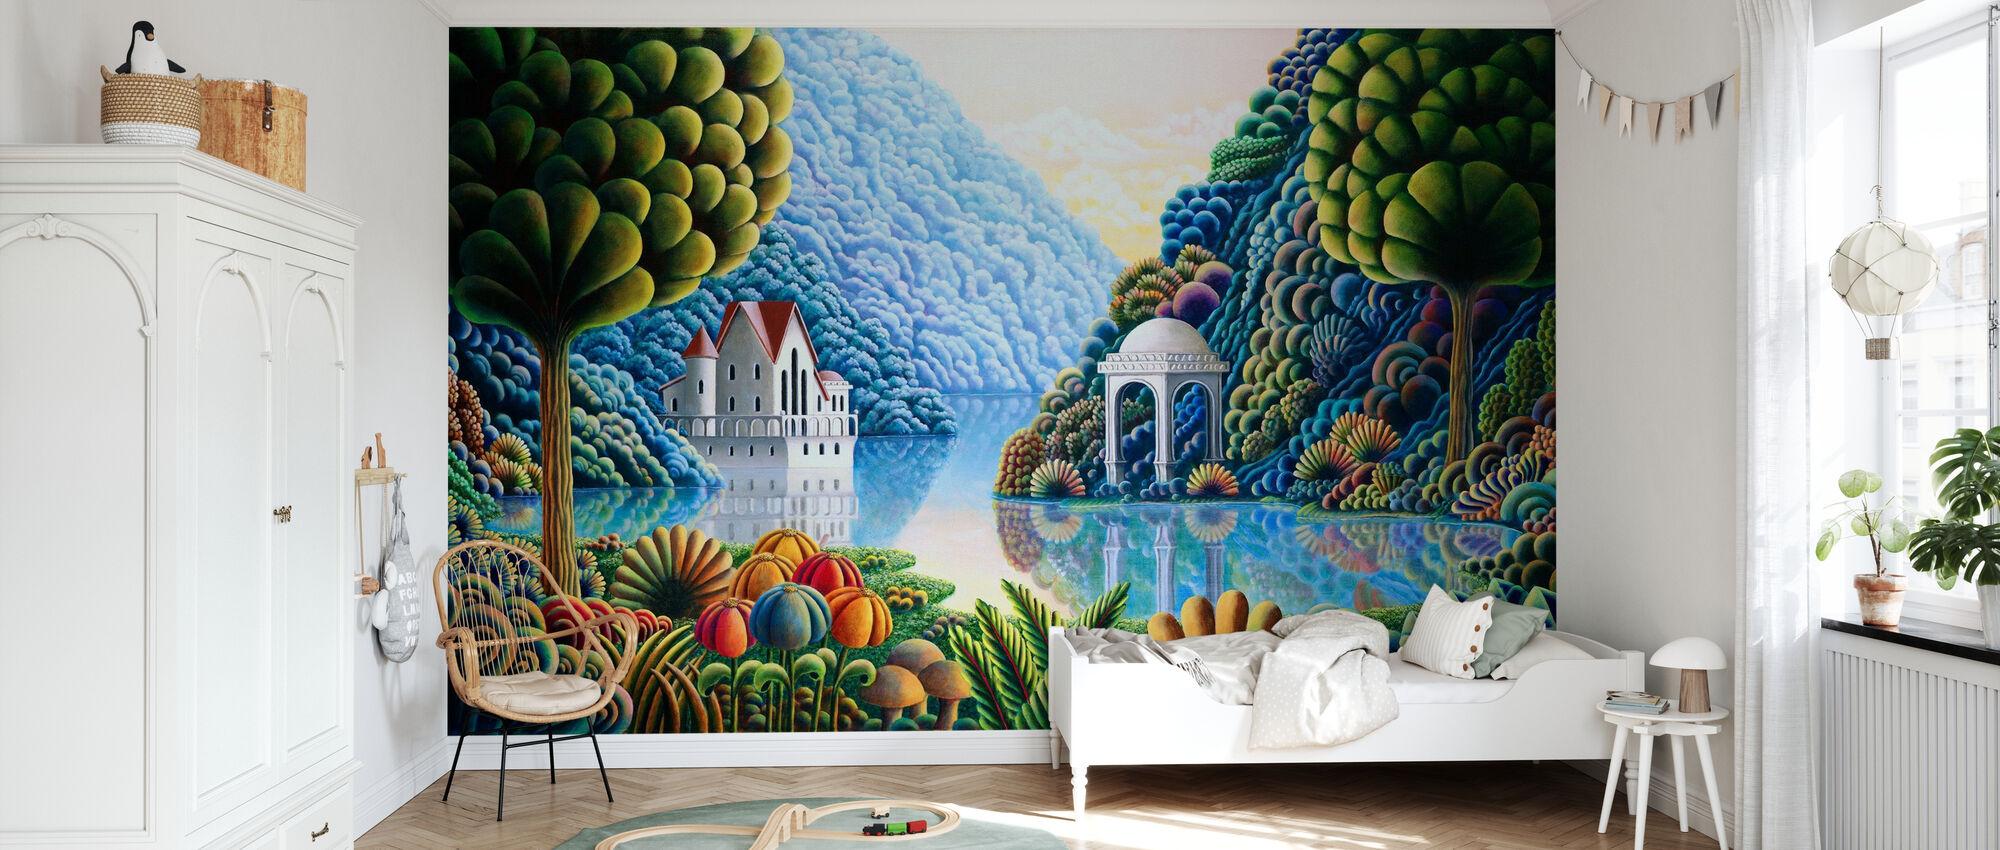 Teal Lake - Wallpaper - Kids Room